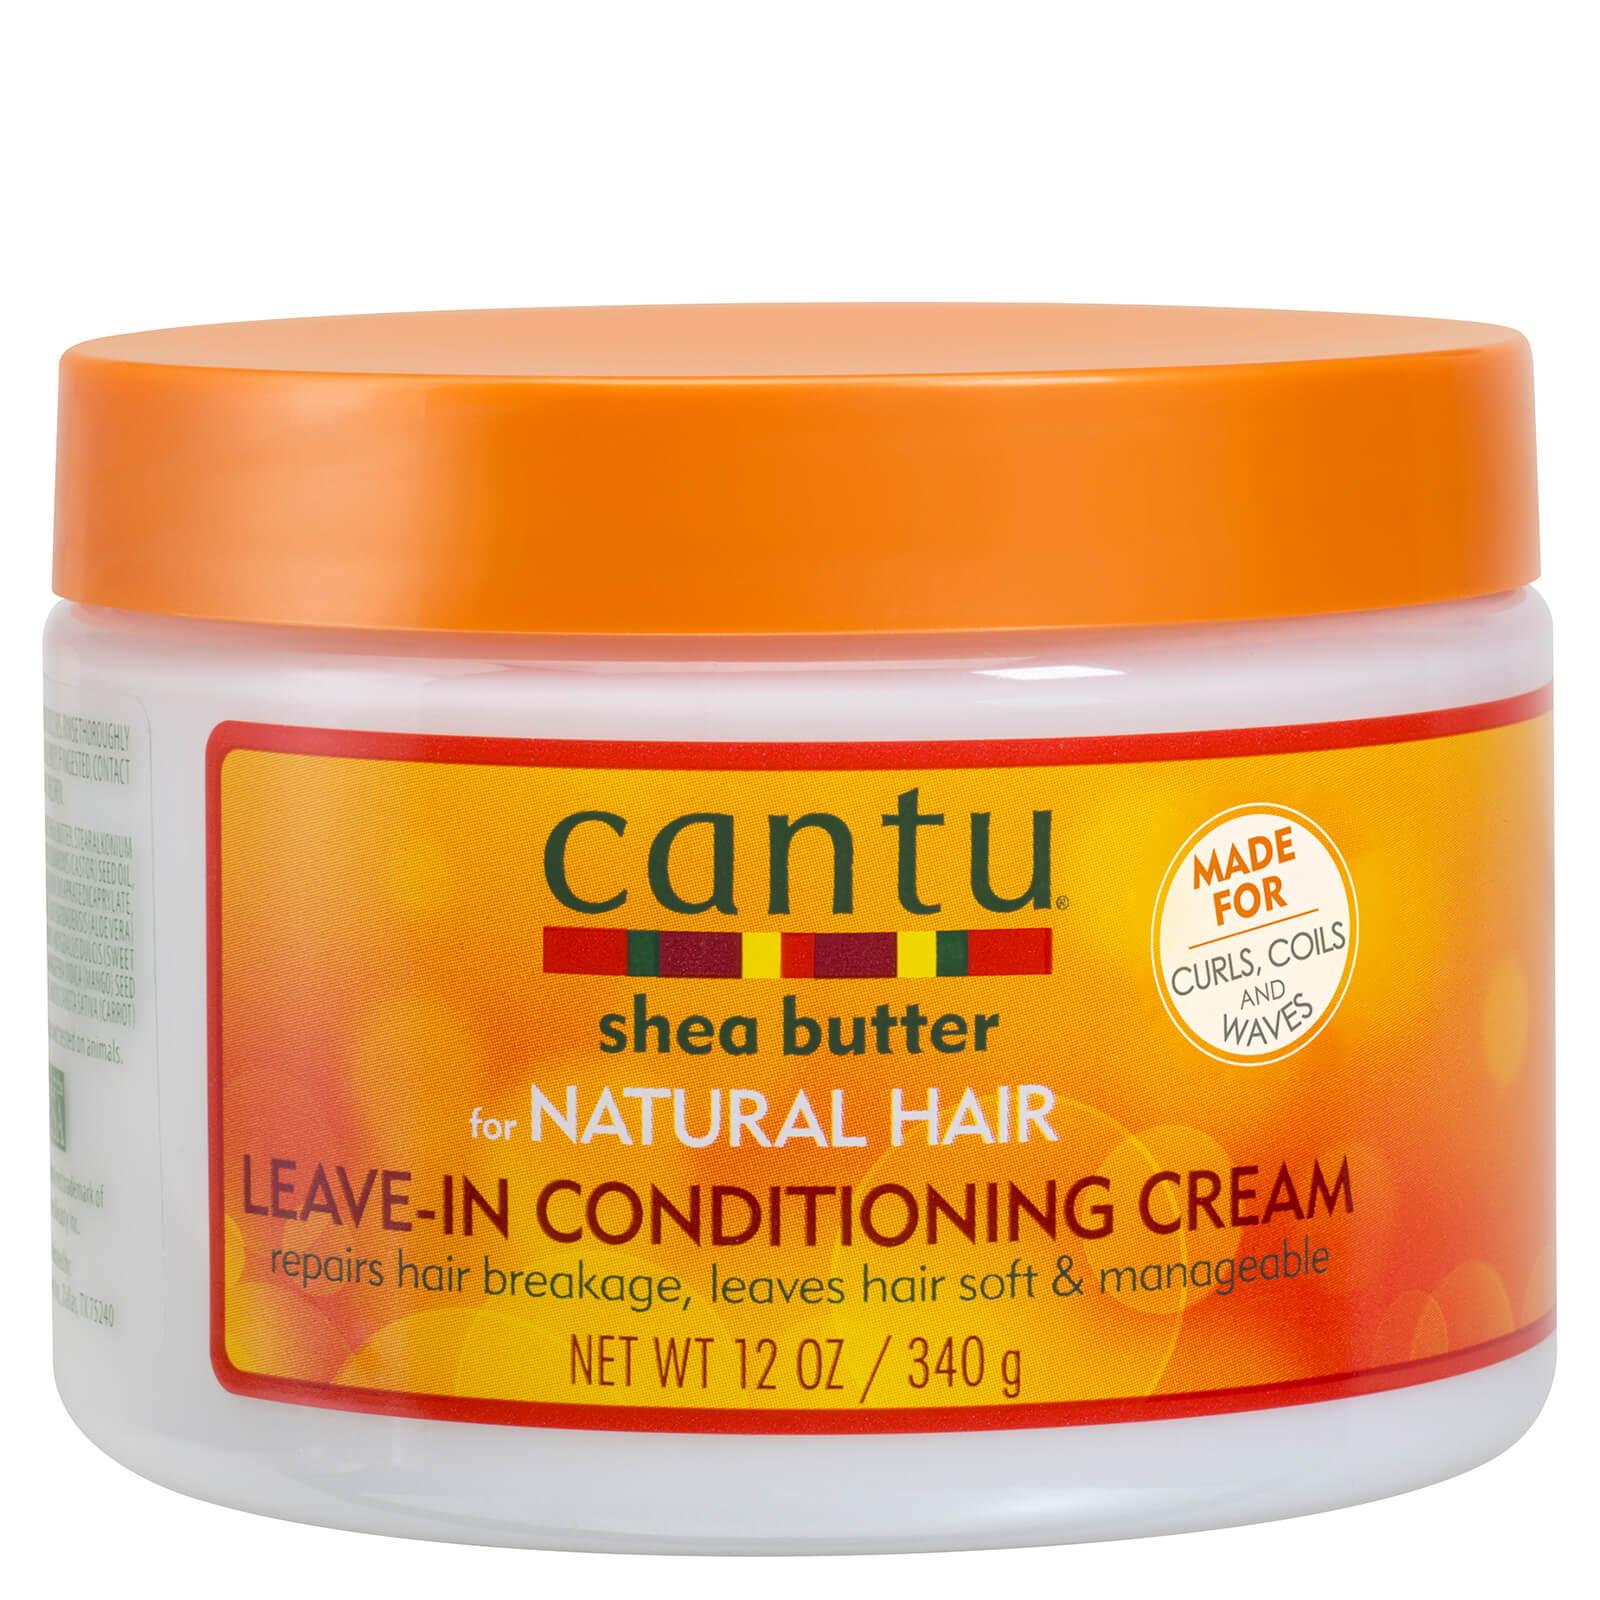 Купить Cantu Natural Leave-In Conditioning Cream 340g